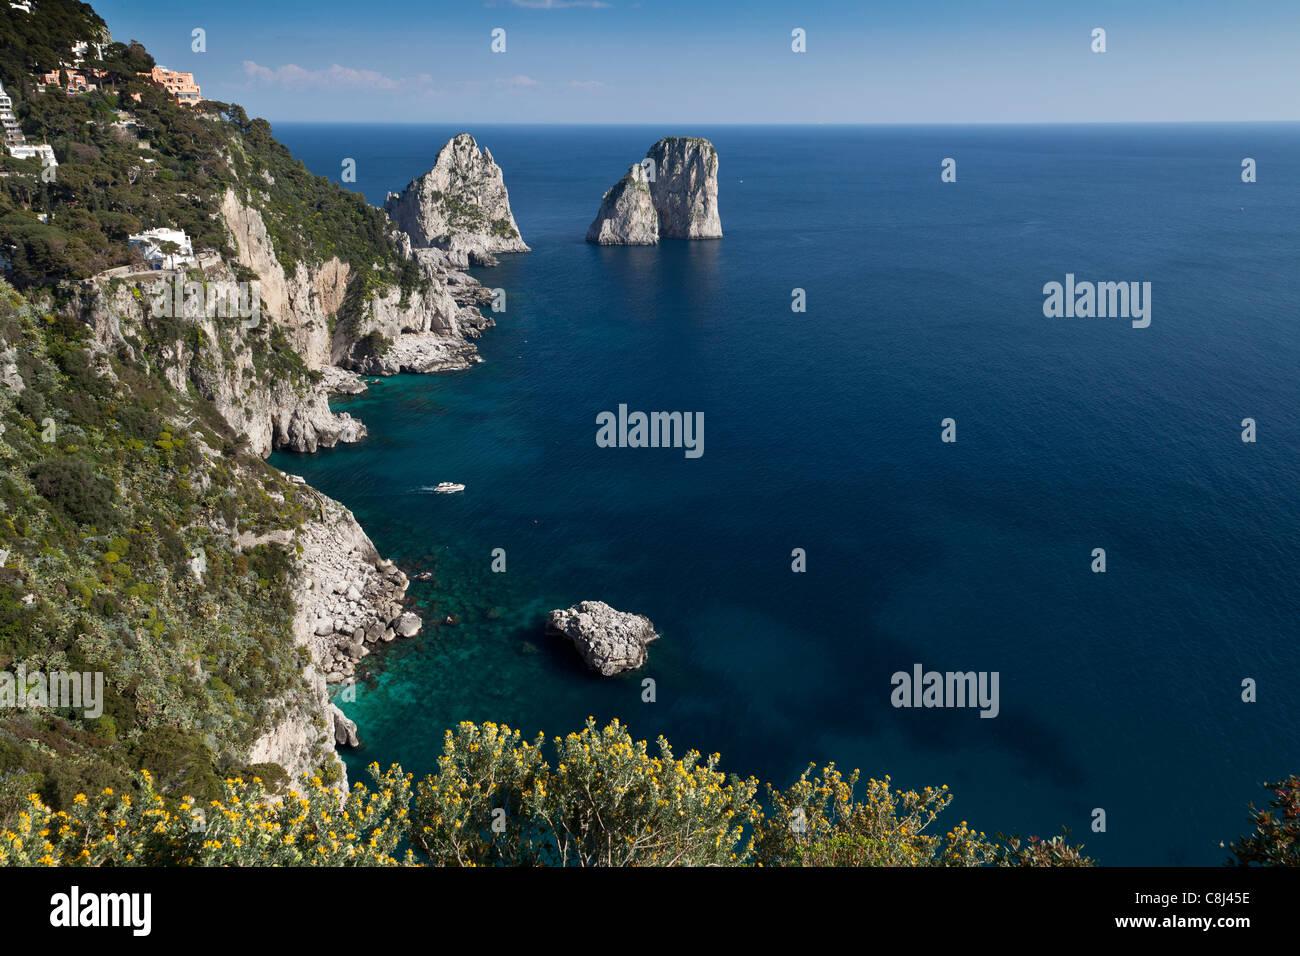 Campania, Capri, Fels, Golf von Neapel, Il Capo, Insel, Inselgruppe, Italien, Kampanien, Meer, Mittelmeer - Stock Image